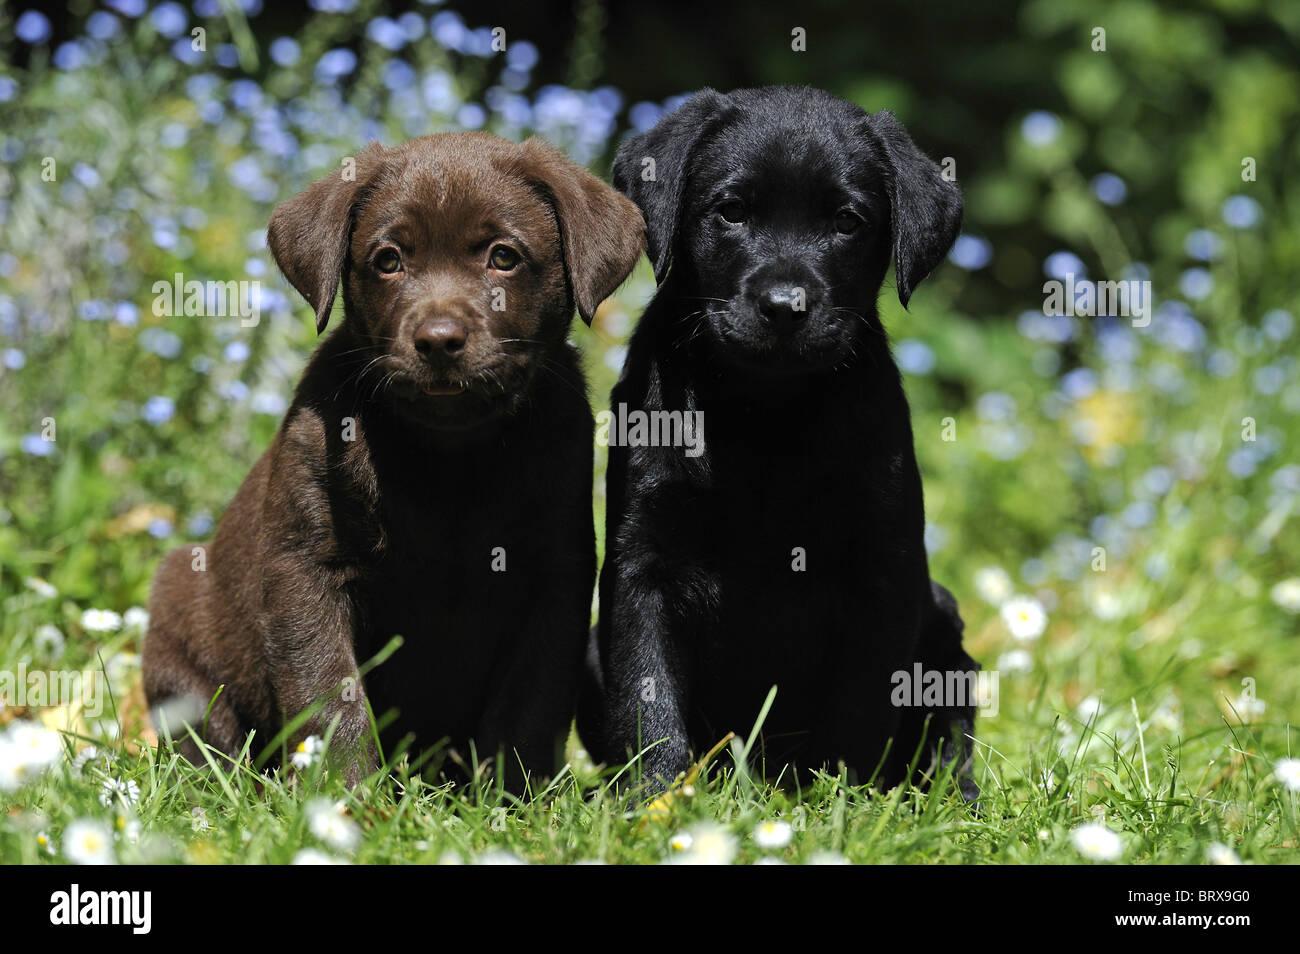 Labrador Retriever, Chocolate Labrador (Canis lupus familiaris). A brown and a black puppy sitting in a garden. - Stock Image